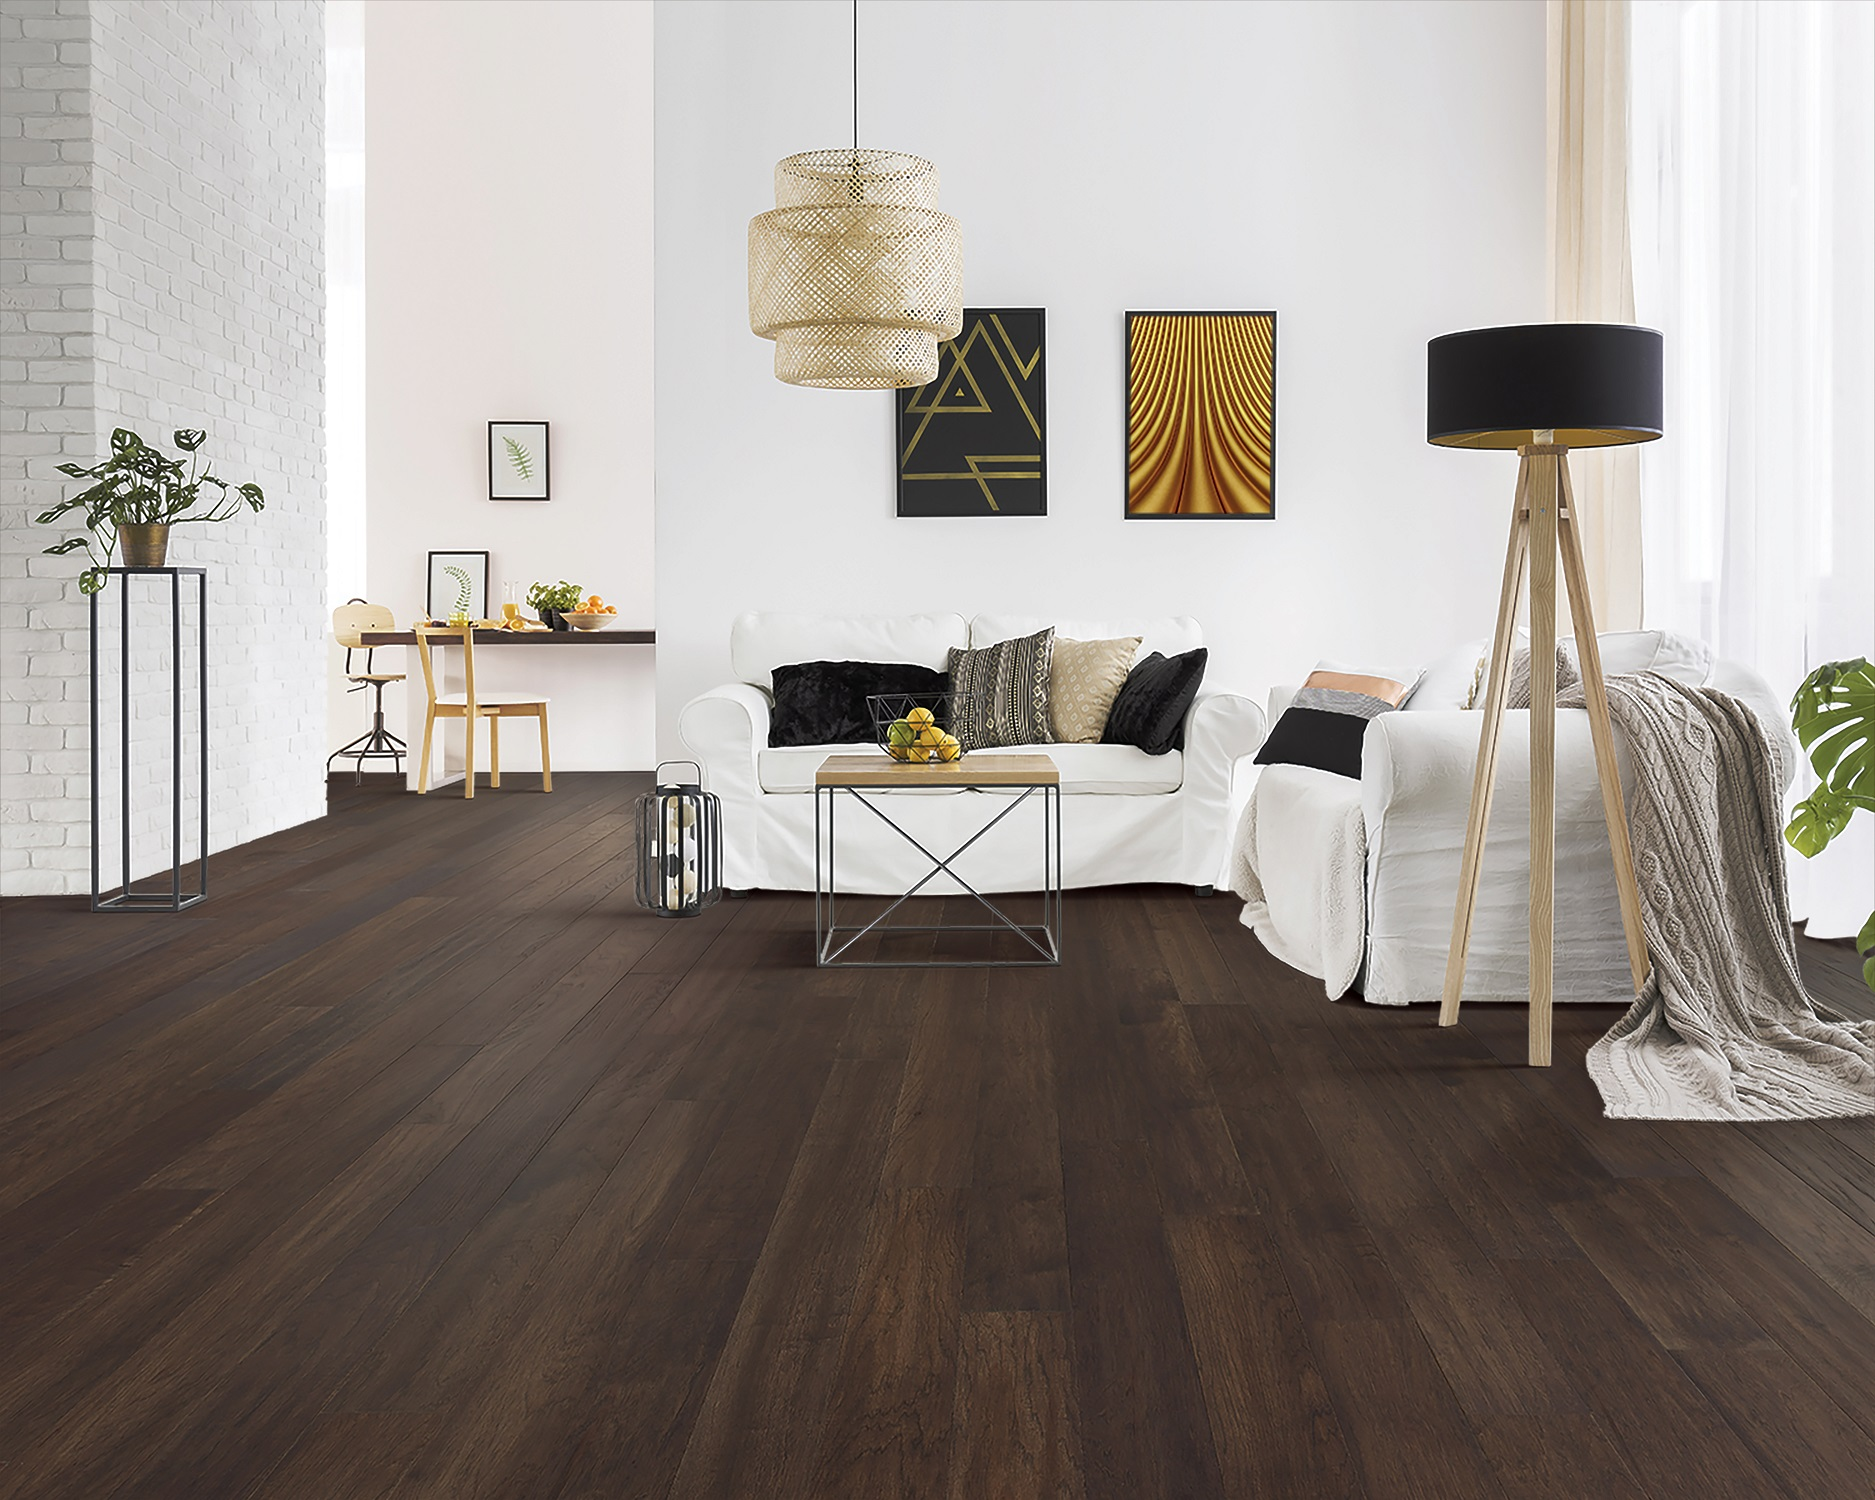 Beautiful hardwood flooring in a Portland, OR home